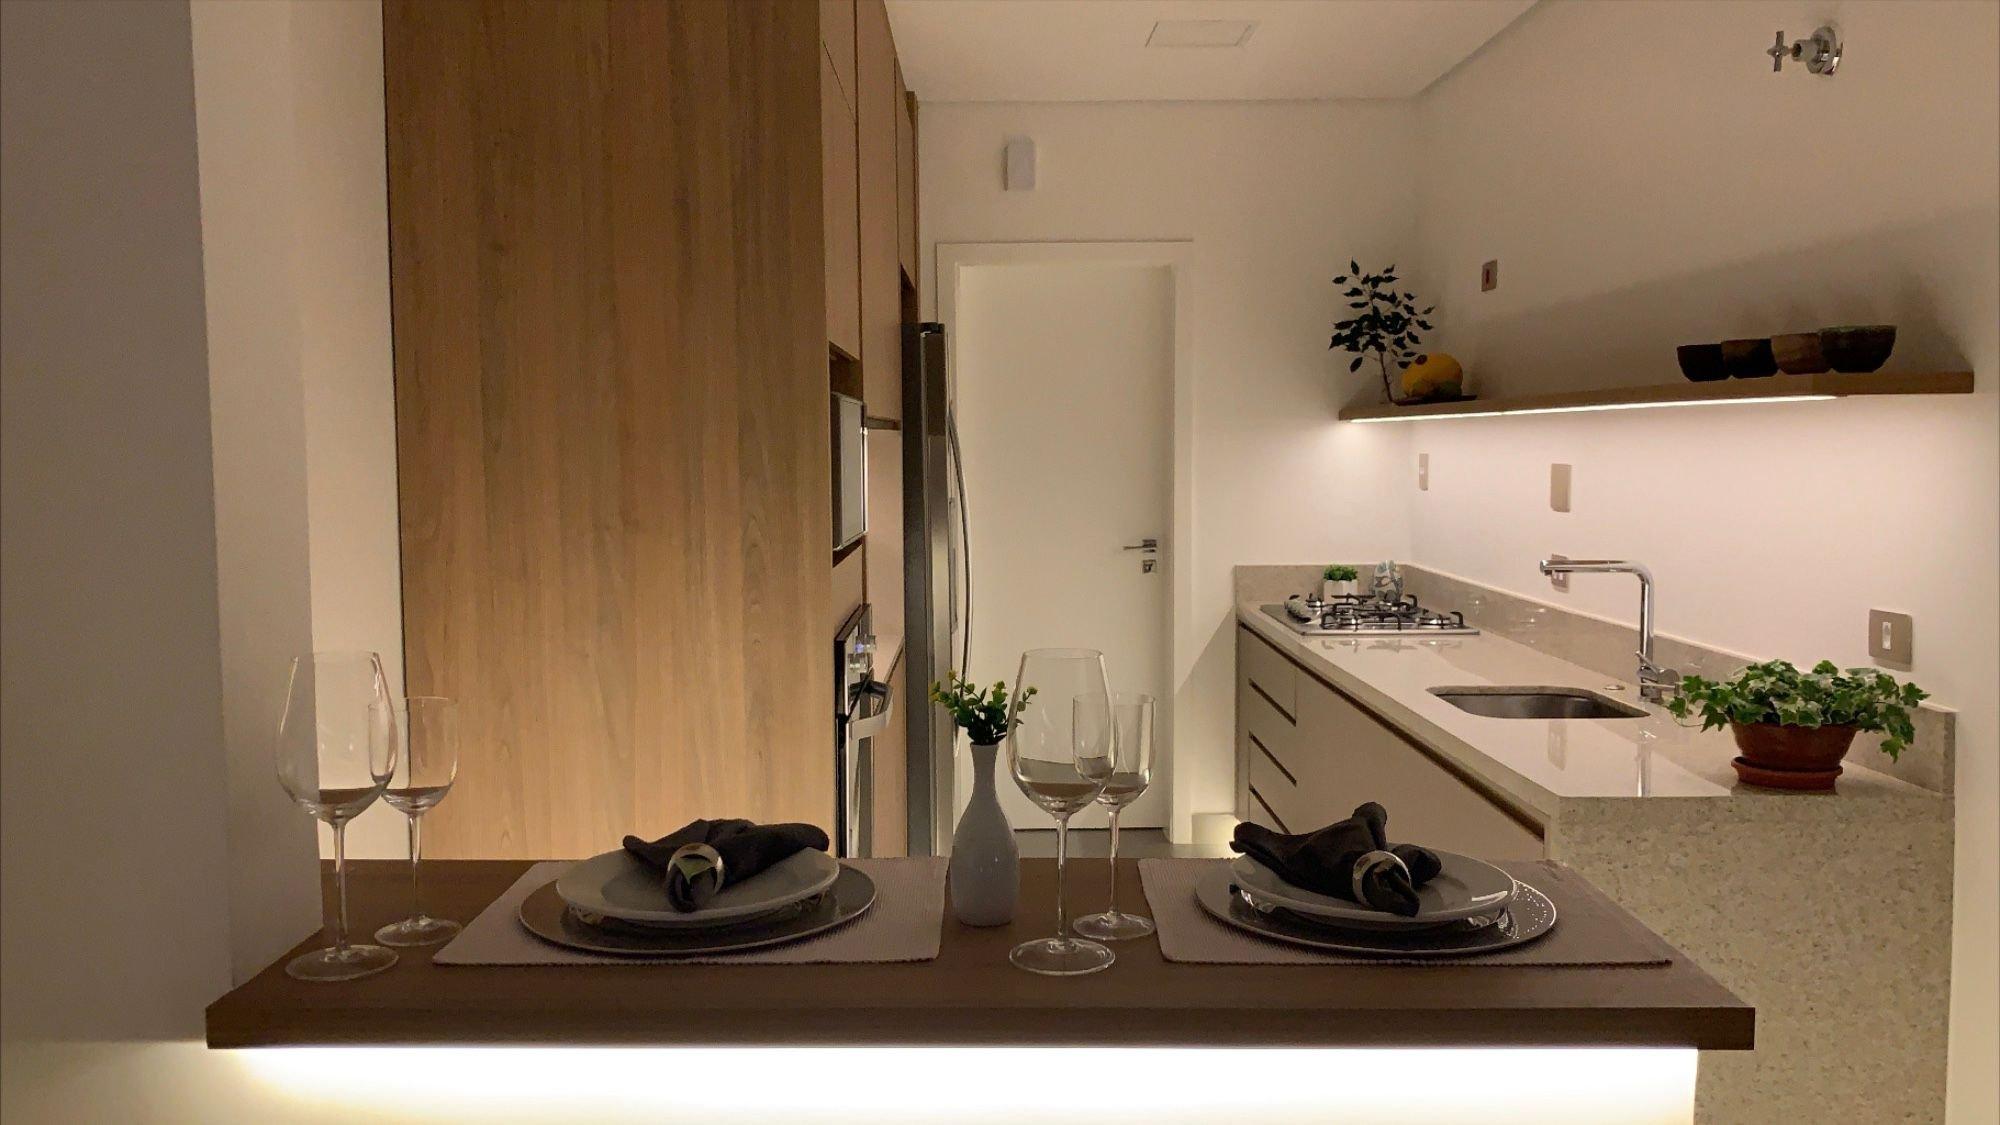 Foto de Banheiro com vaso de planta, copo de vinho, vaso, pia